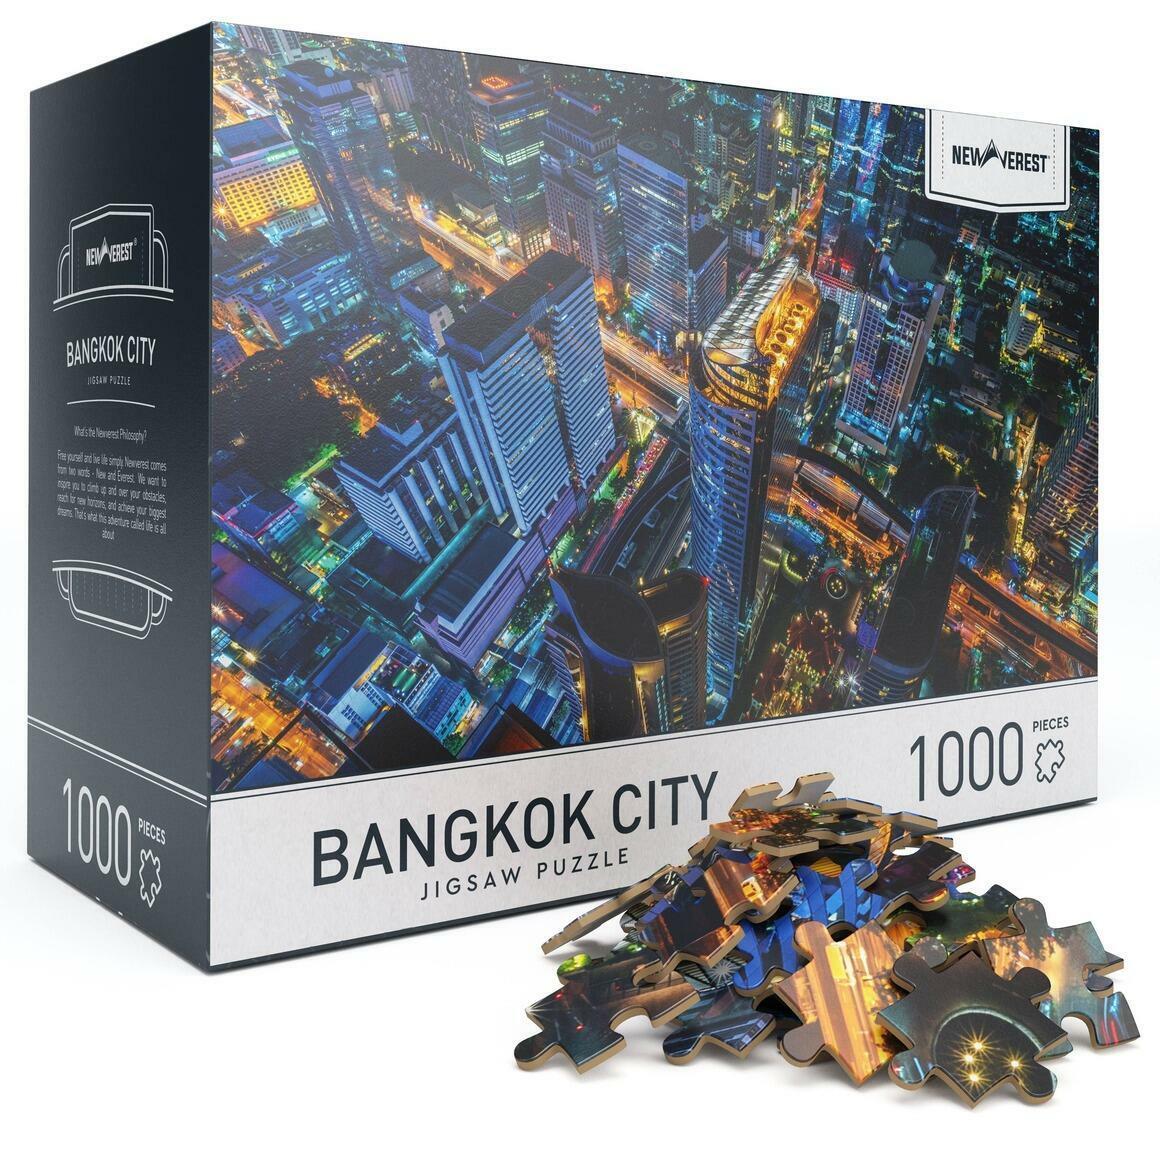 1000 pcs Newverest Bangkok City Jigsaw Puzzle | Trada Marketplace